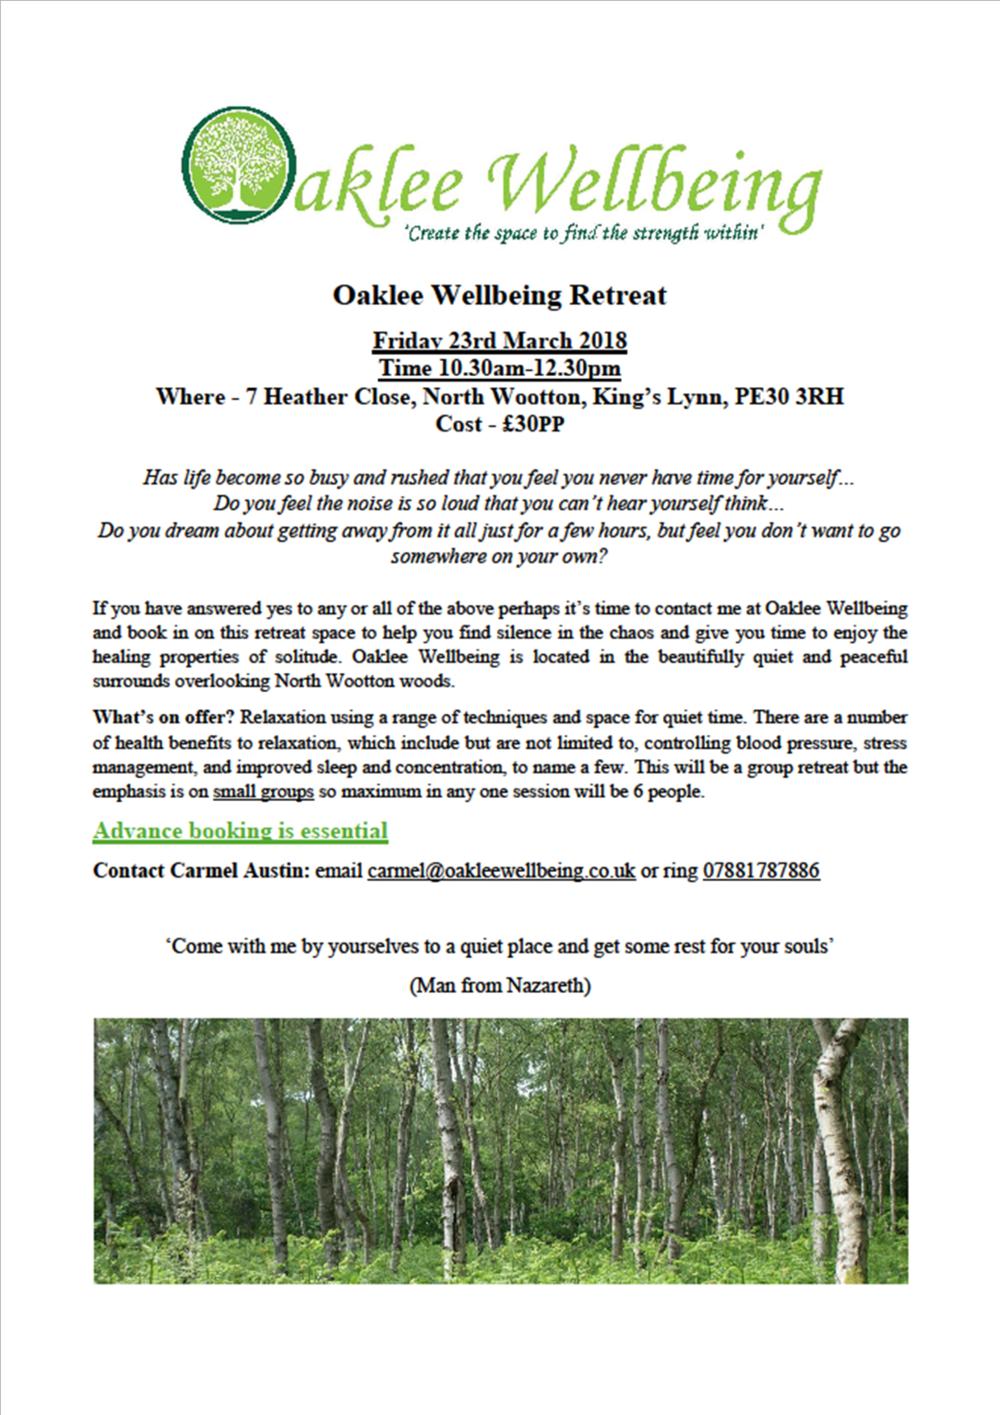 oaklee wellbeing retreat.png